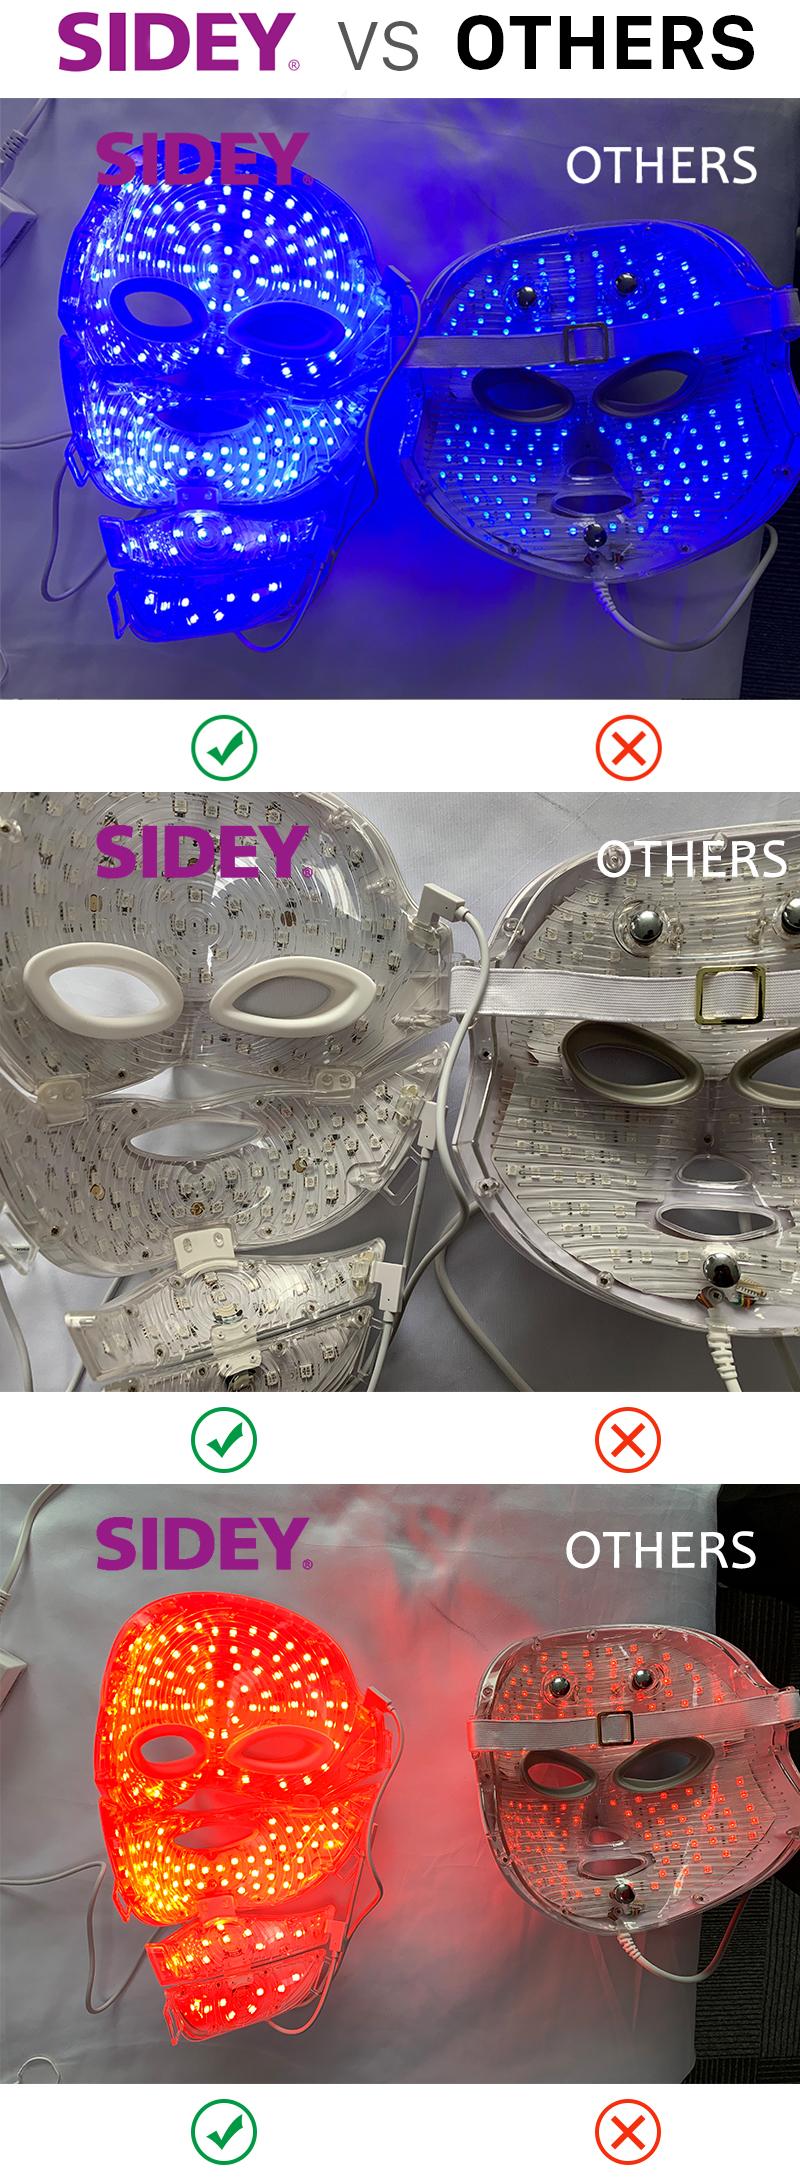 SIDEY New Arrival Wholesale Price 홈 Care 휴대용 Skin 젊 어 짐 PDT Led 미백 페이셜 Mask